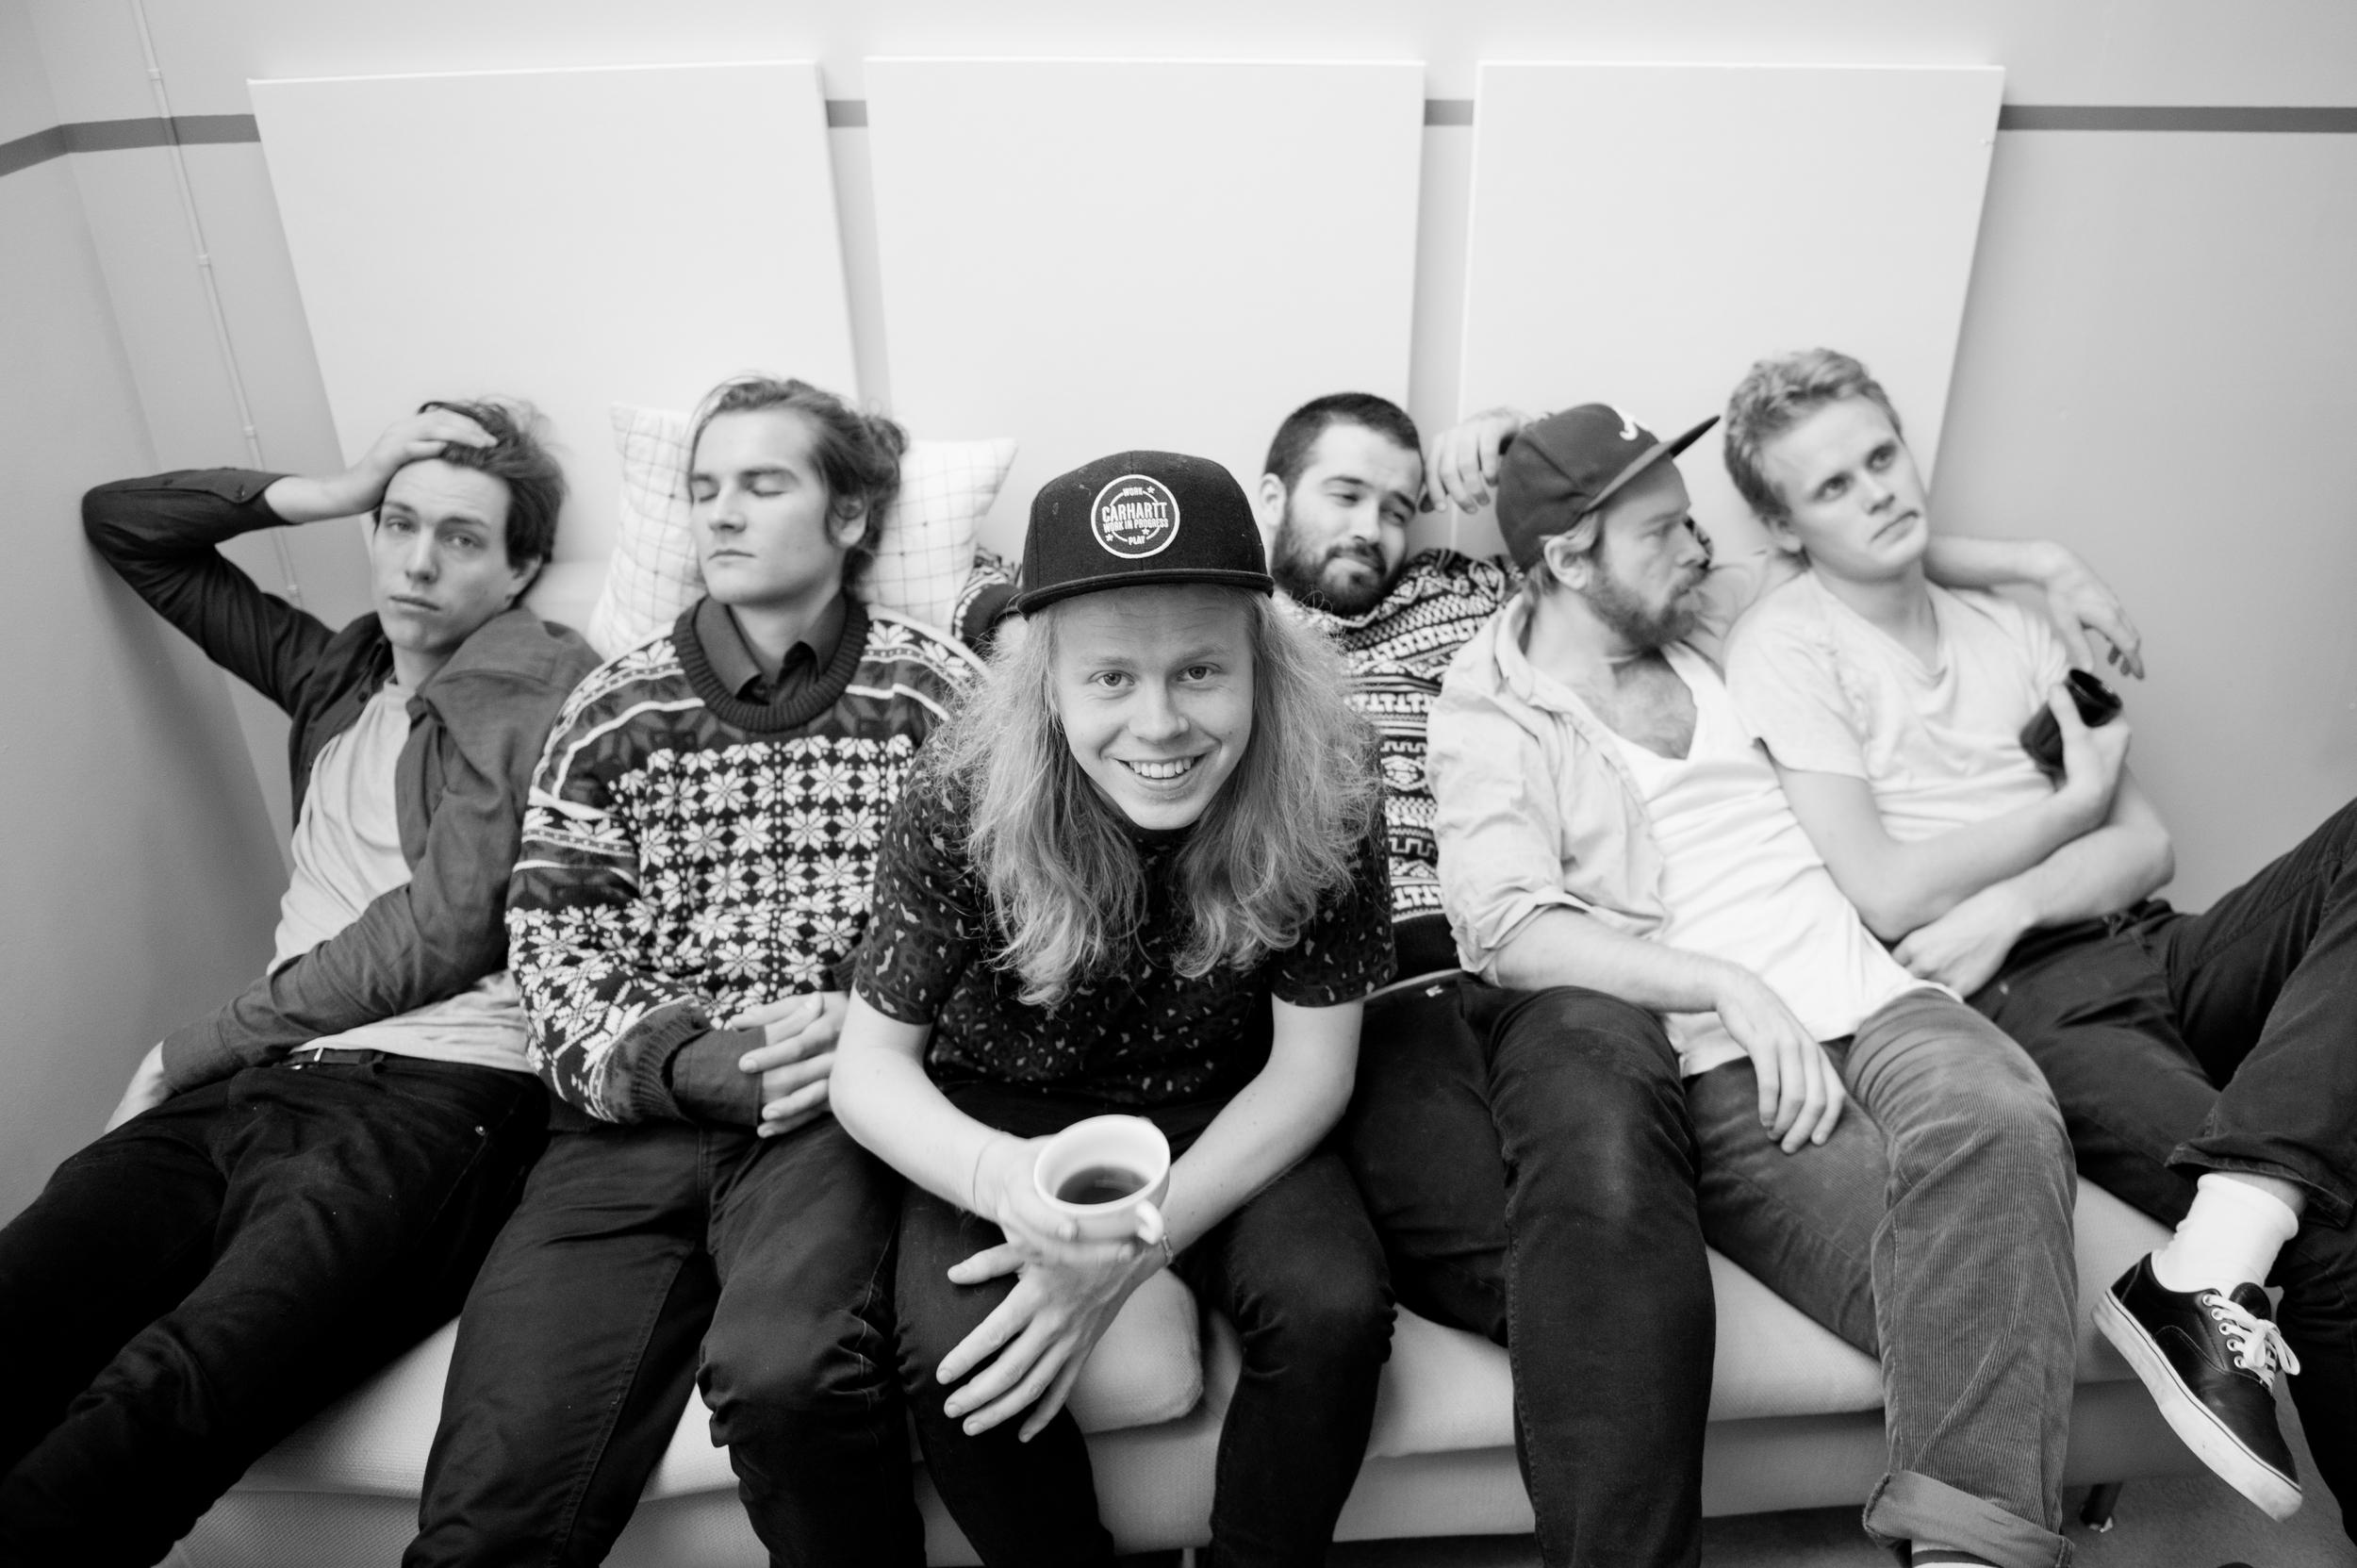 Norwegian indie rock band Kakkmaddafakka is coming to Amsterdam!